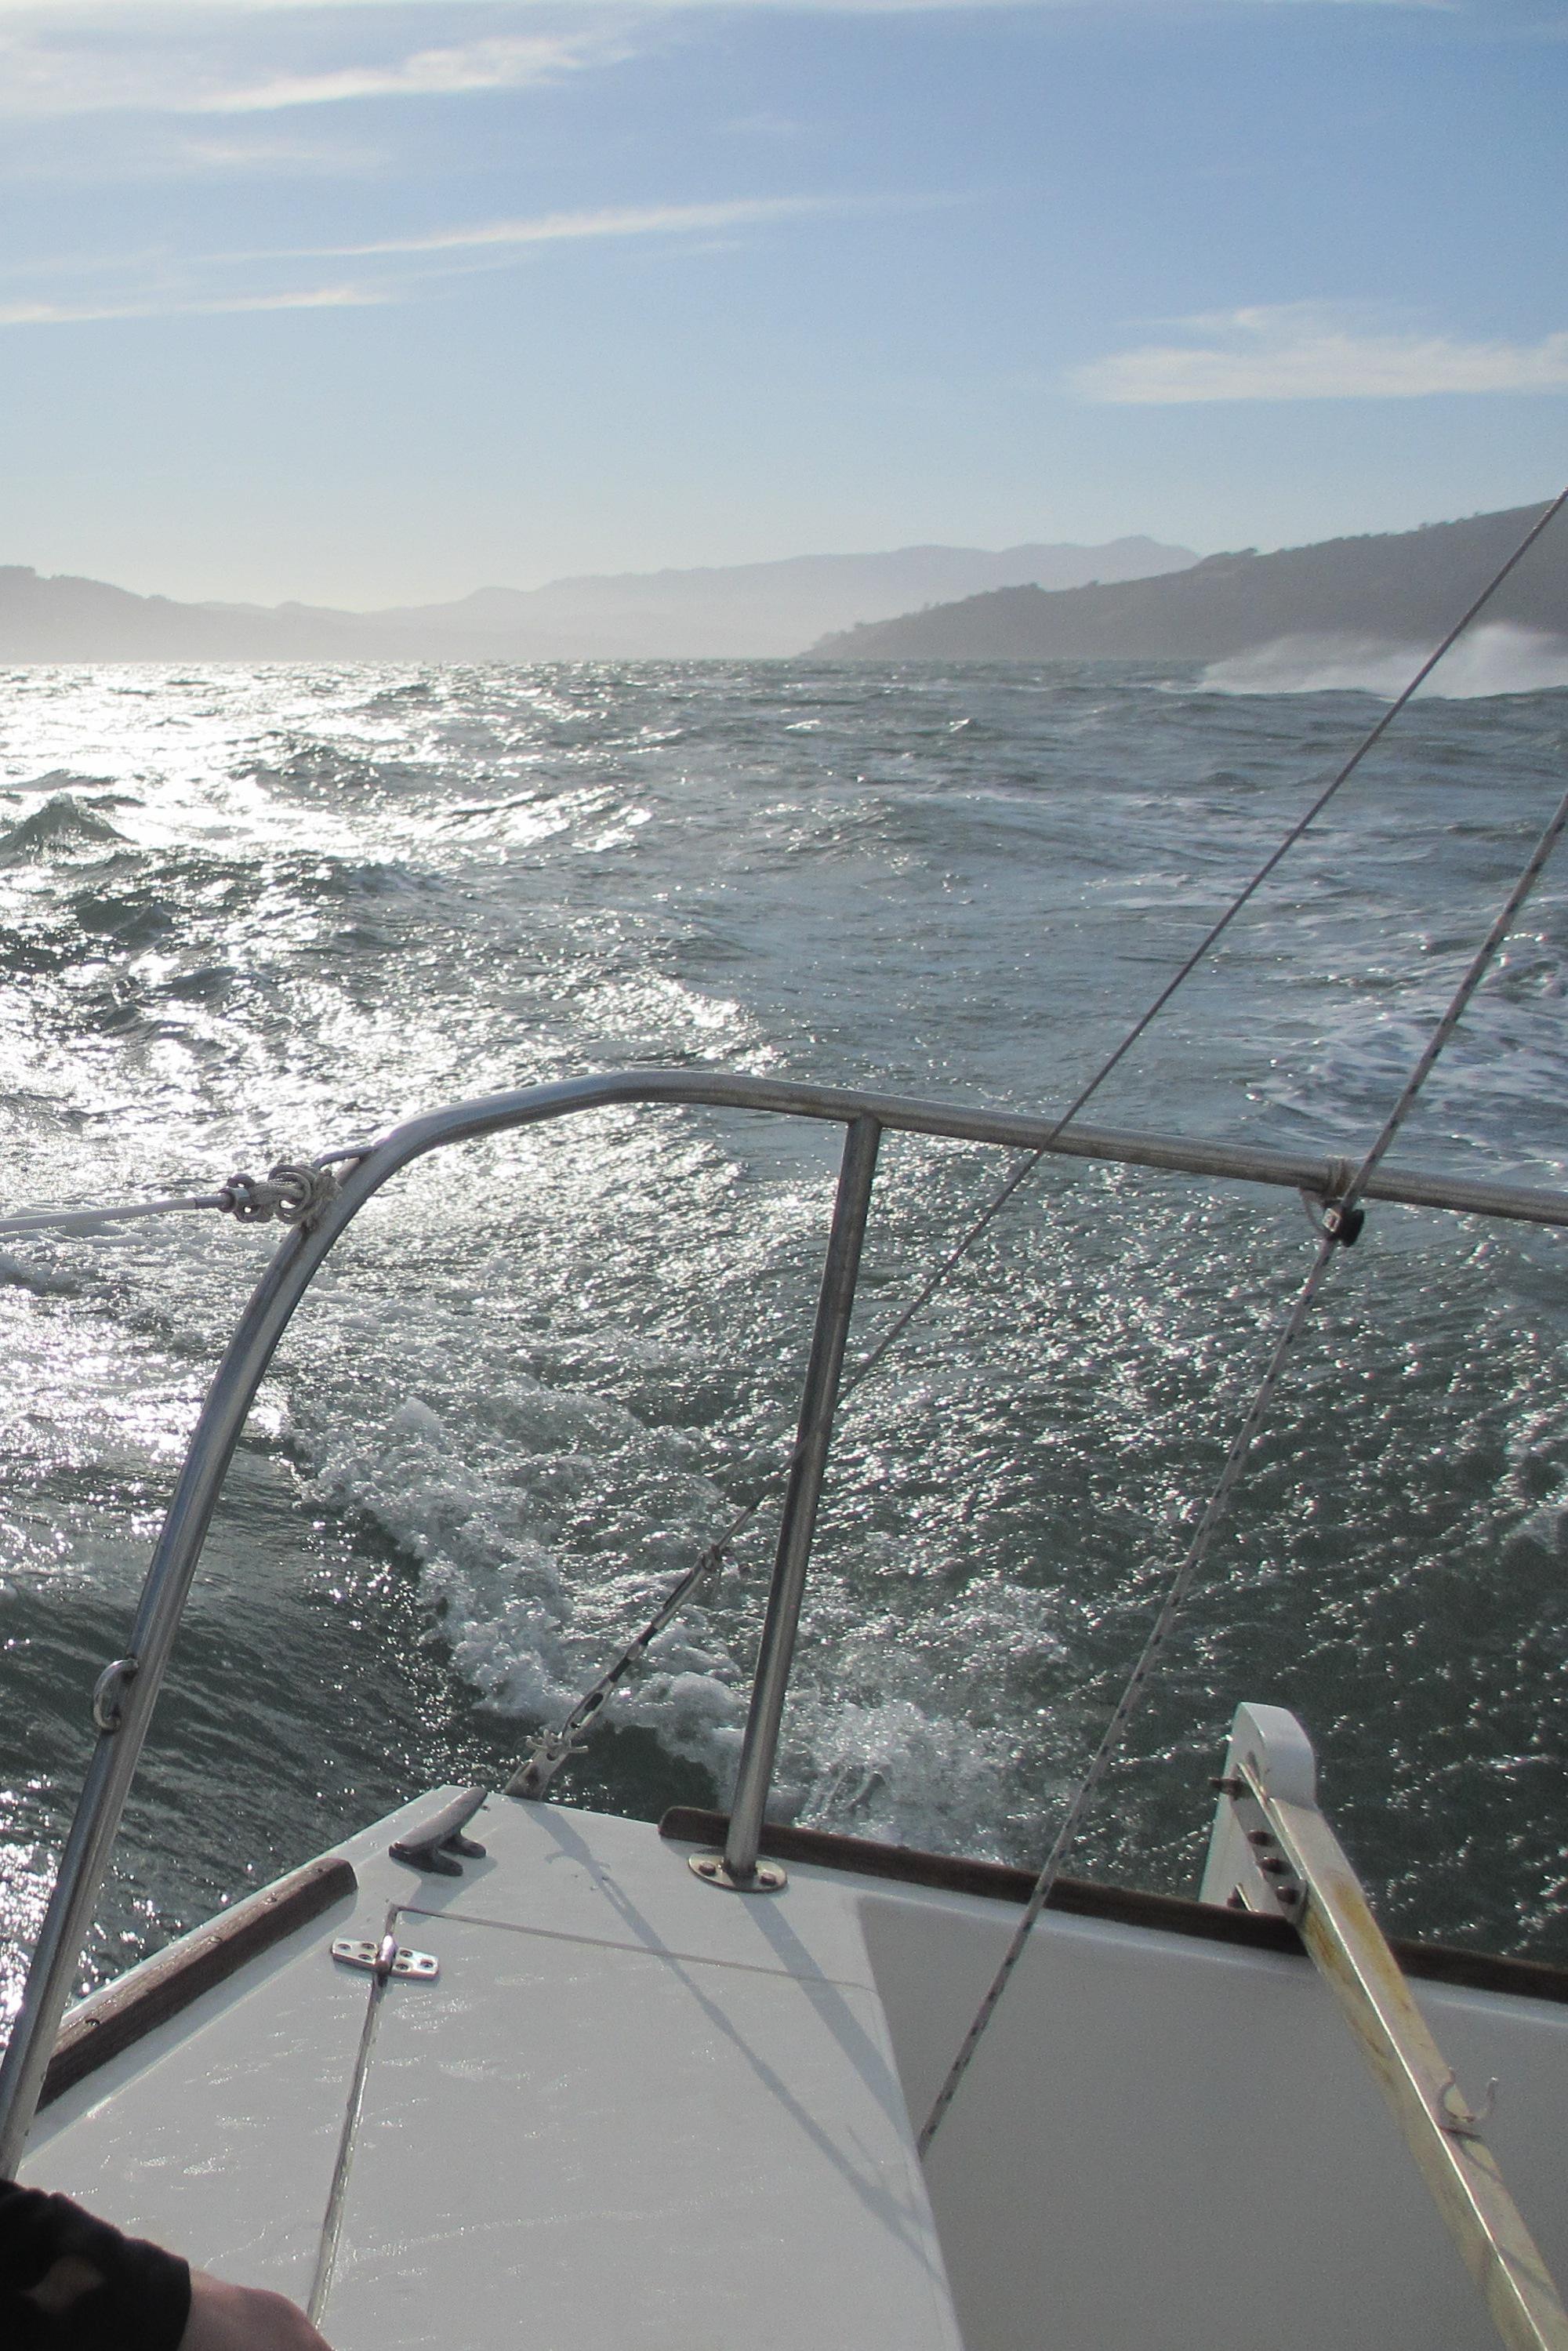 jet ski hits wave